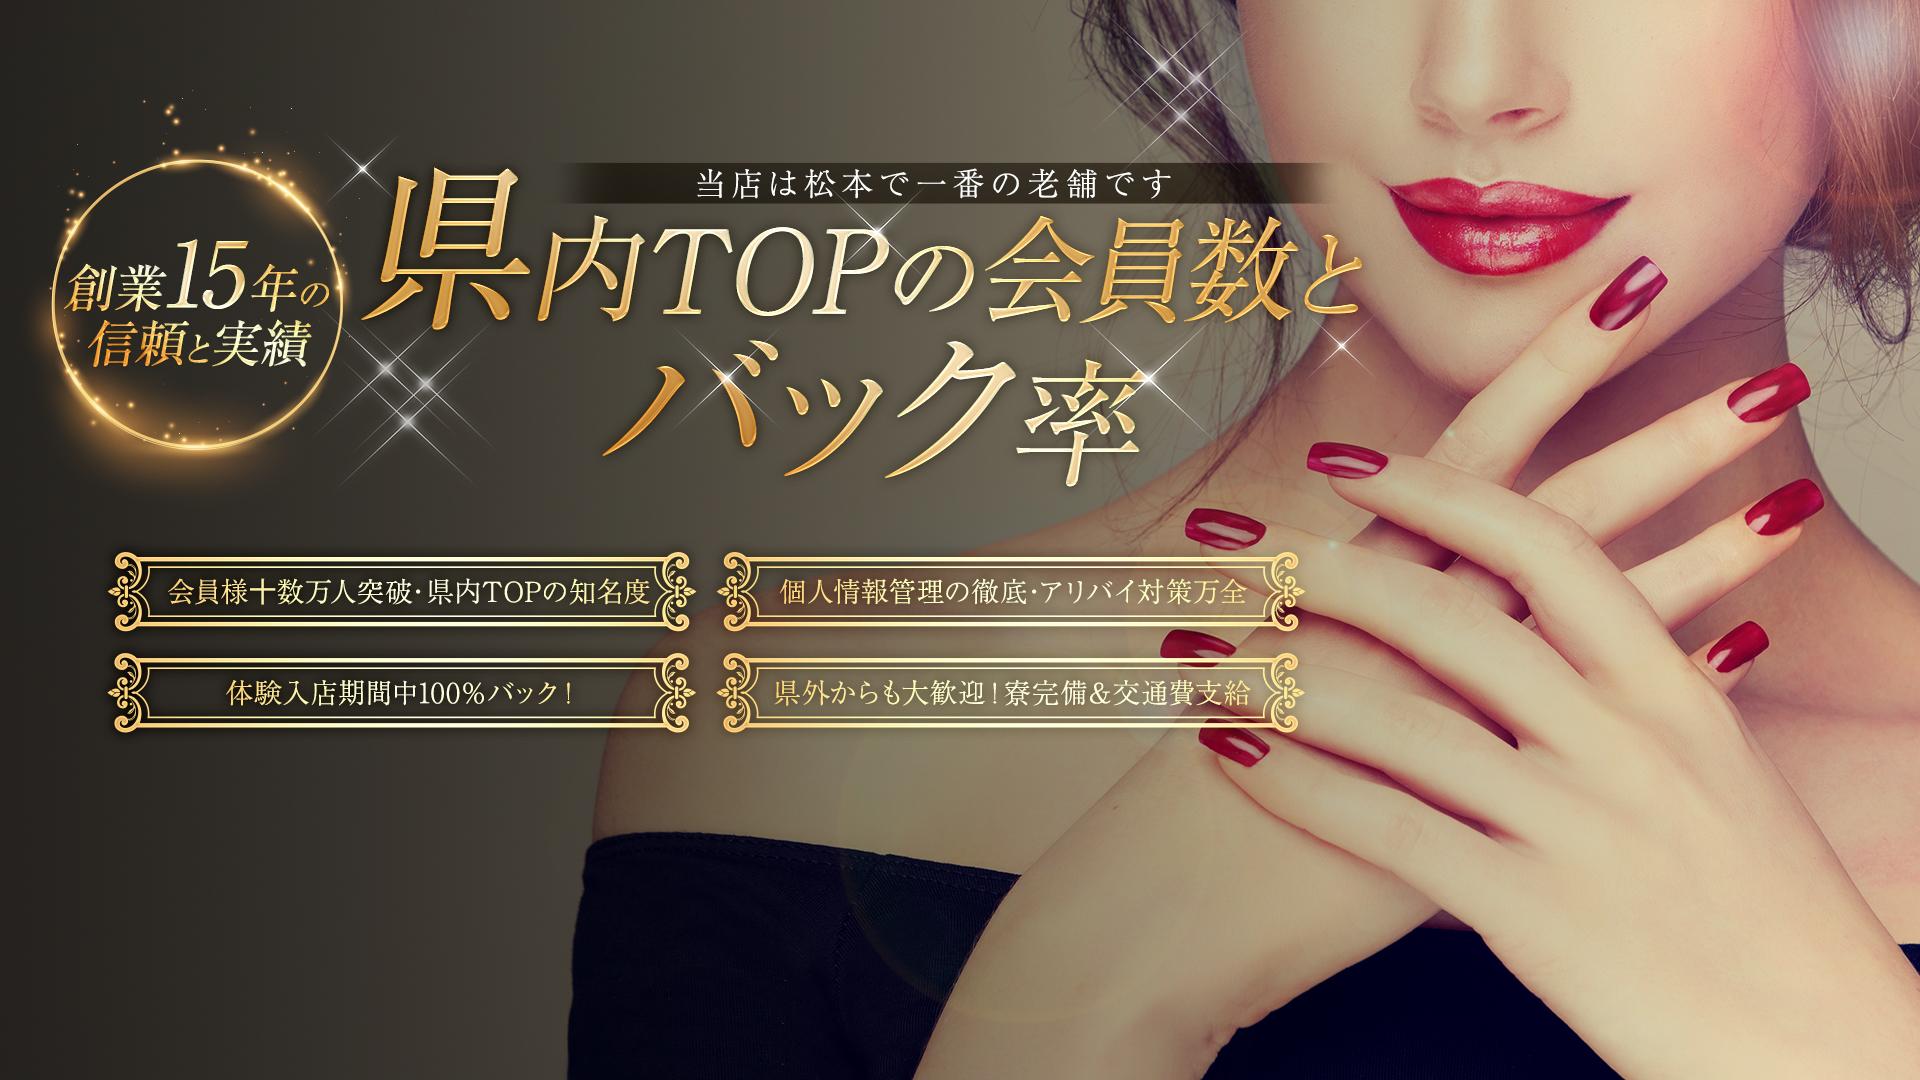 SECRET SERVICE 松本店の求人画像